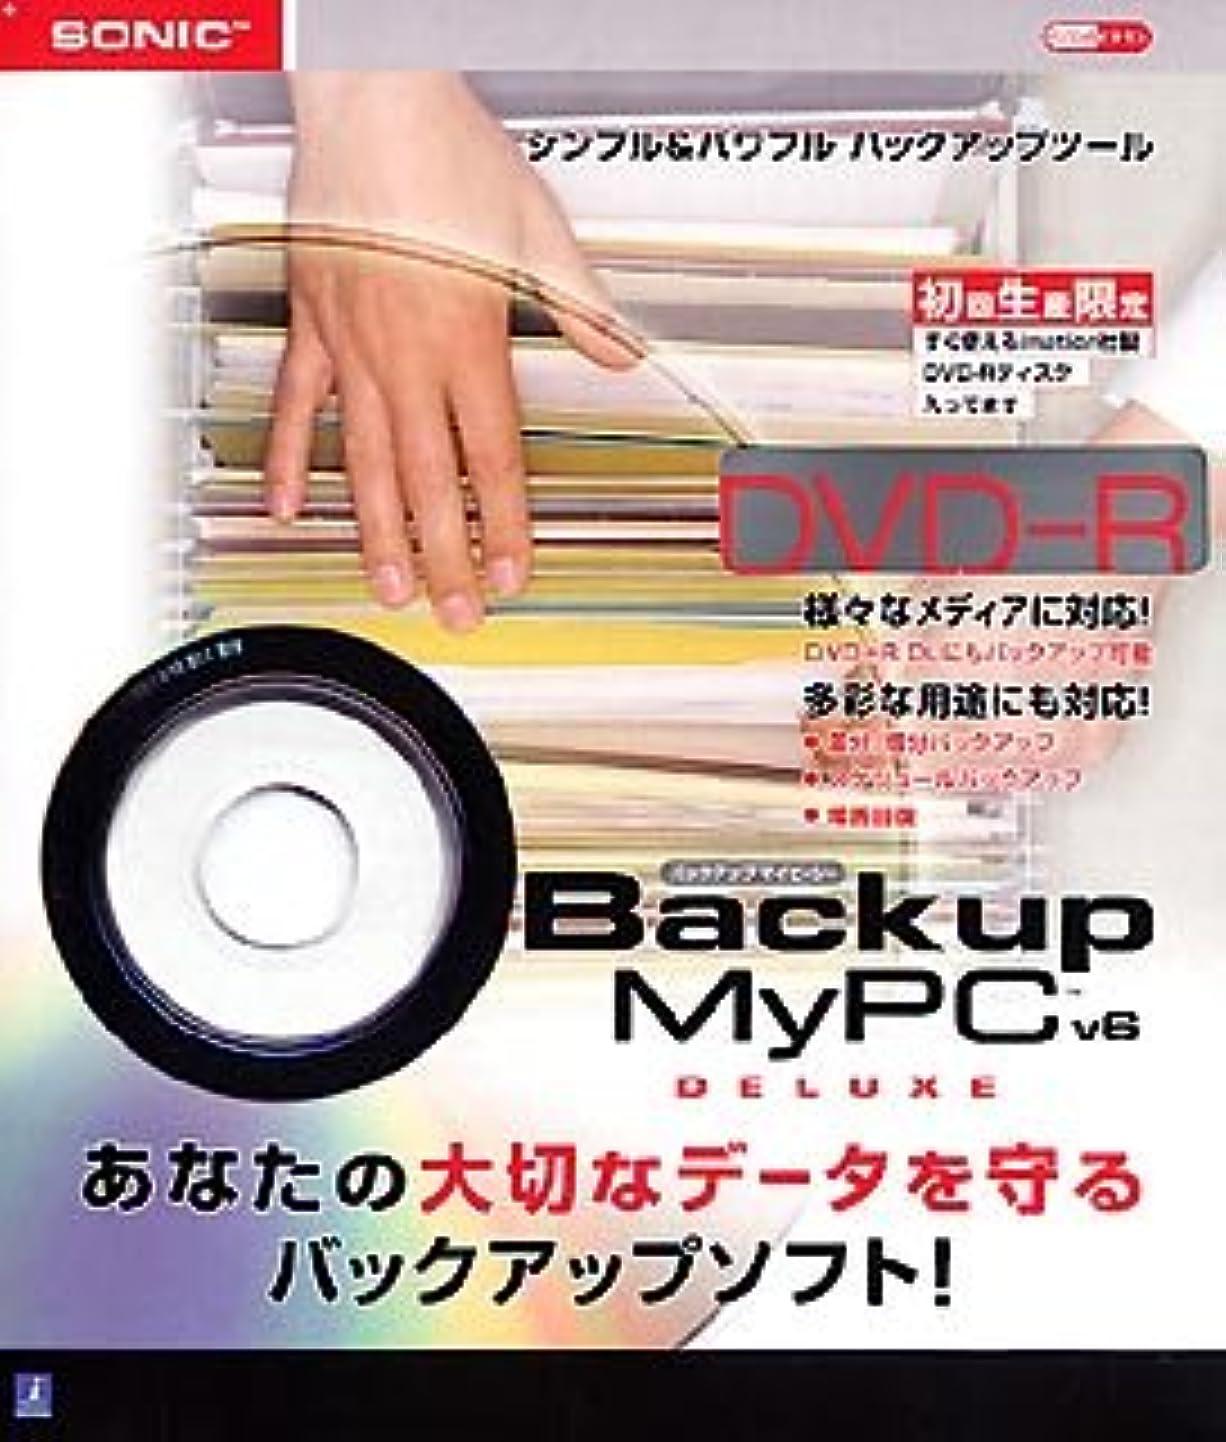 俳優鎮痛剤誘導Backup MyPC Deluxe version 6